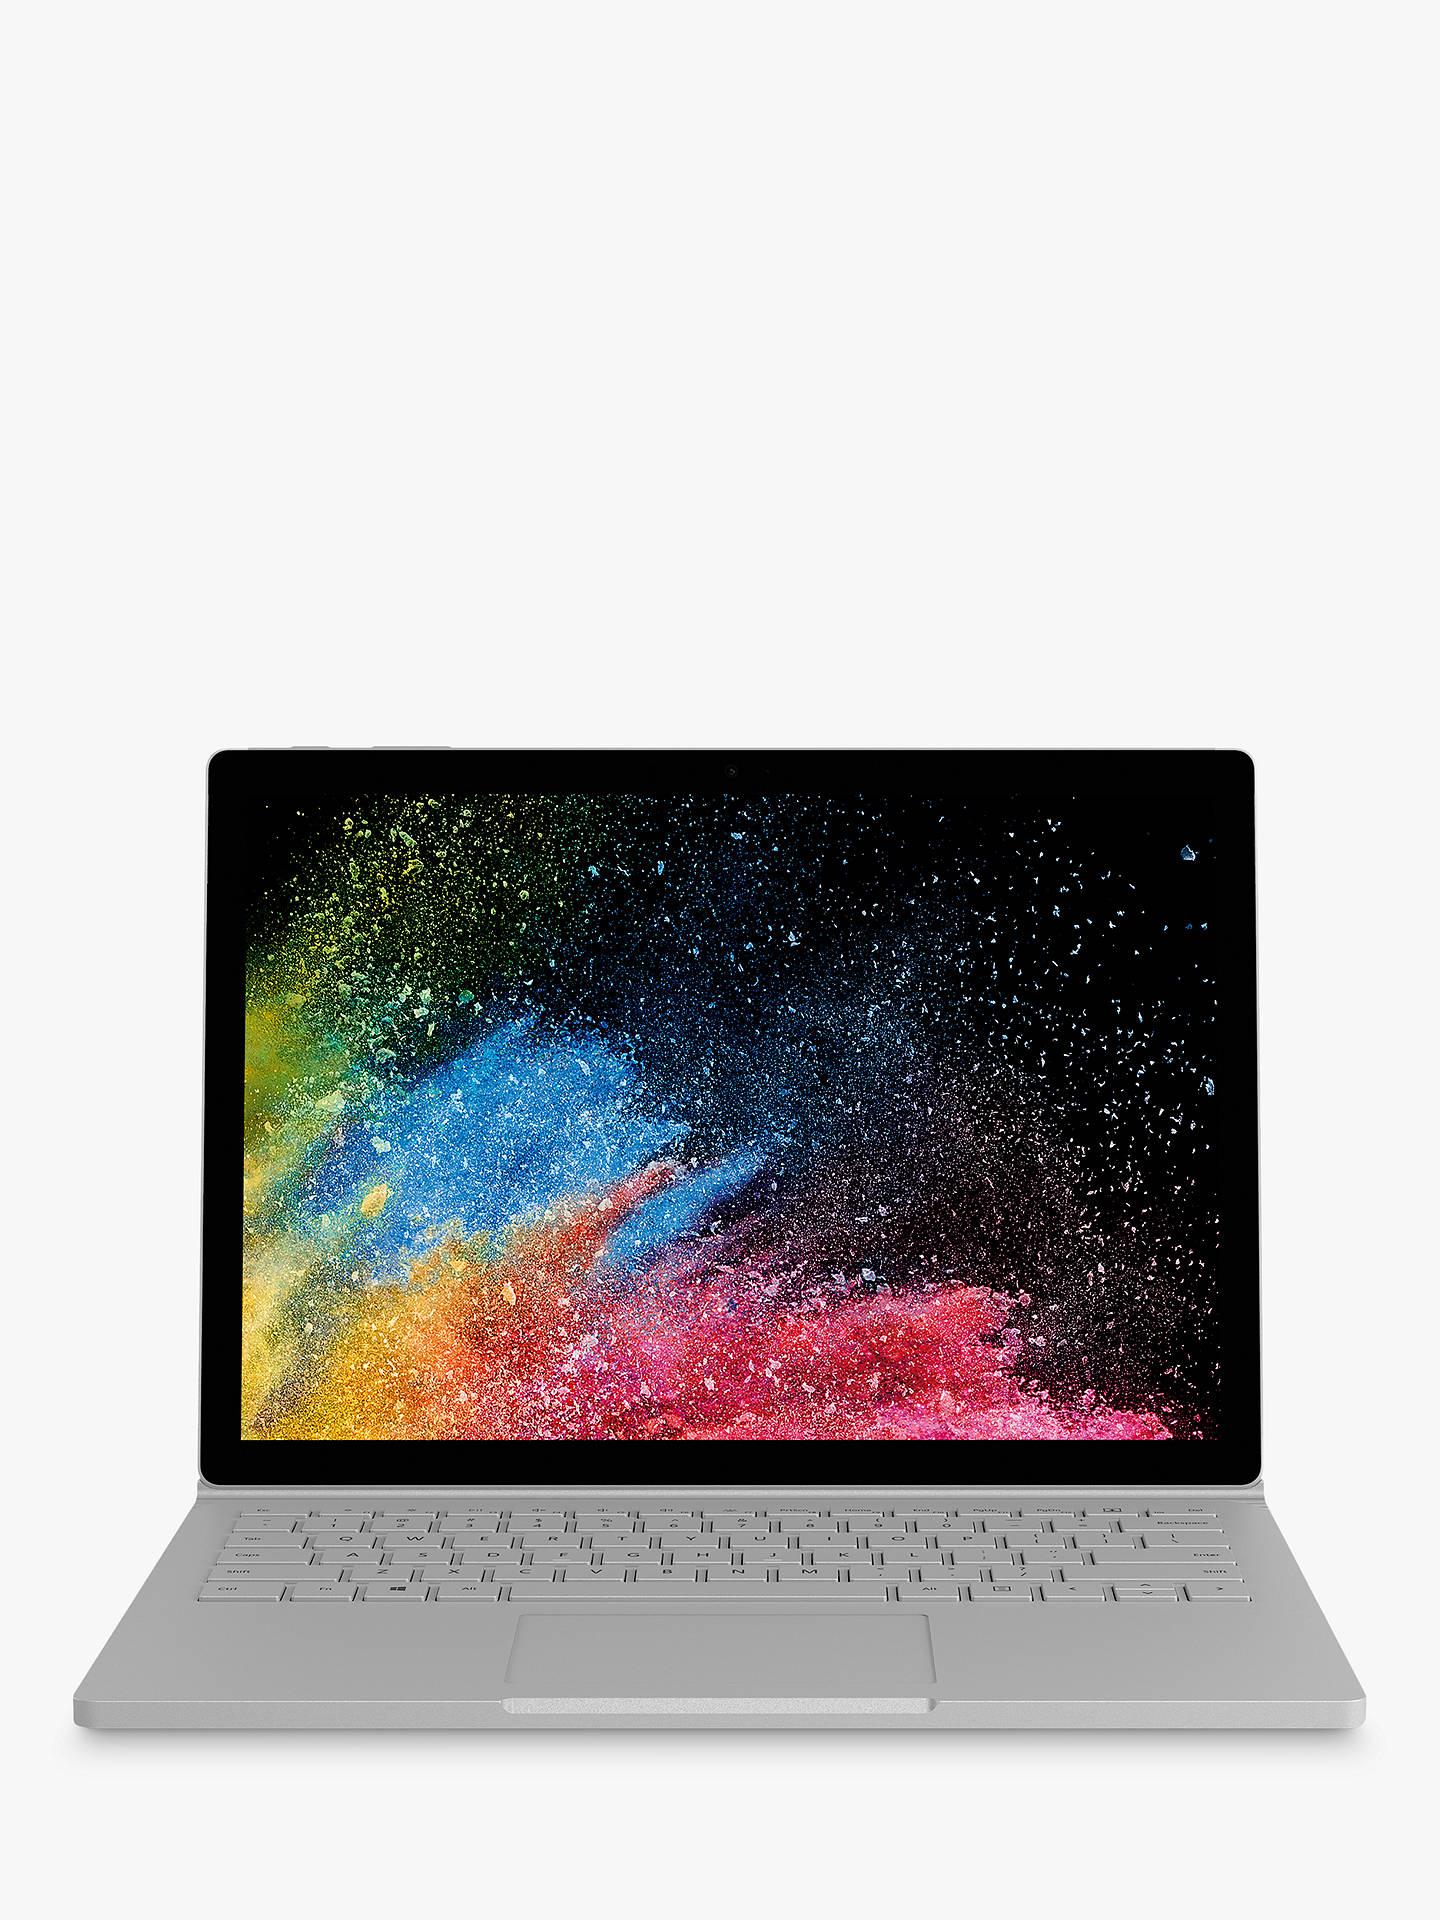 Microsoft Surface Book 2 - i5 8350U / 256GB / 8GB RAM (2019 Refresh Model) - £1,299 @ John Lewis & Partners